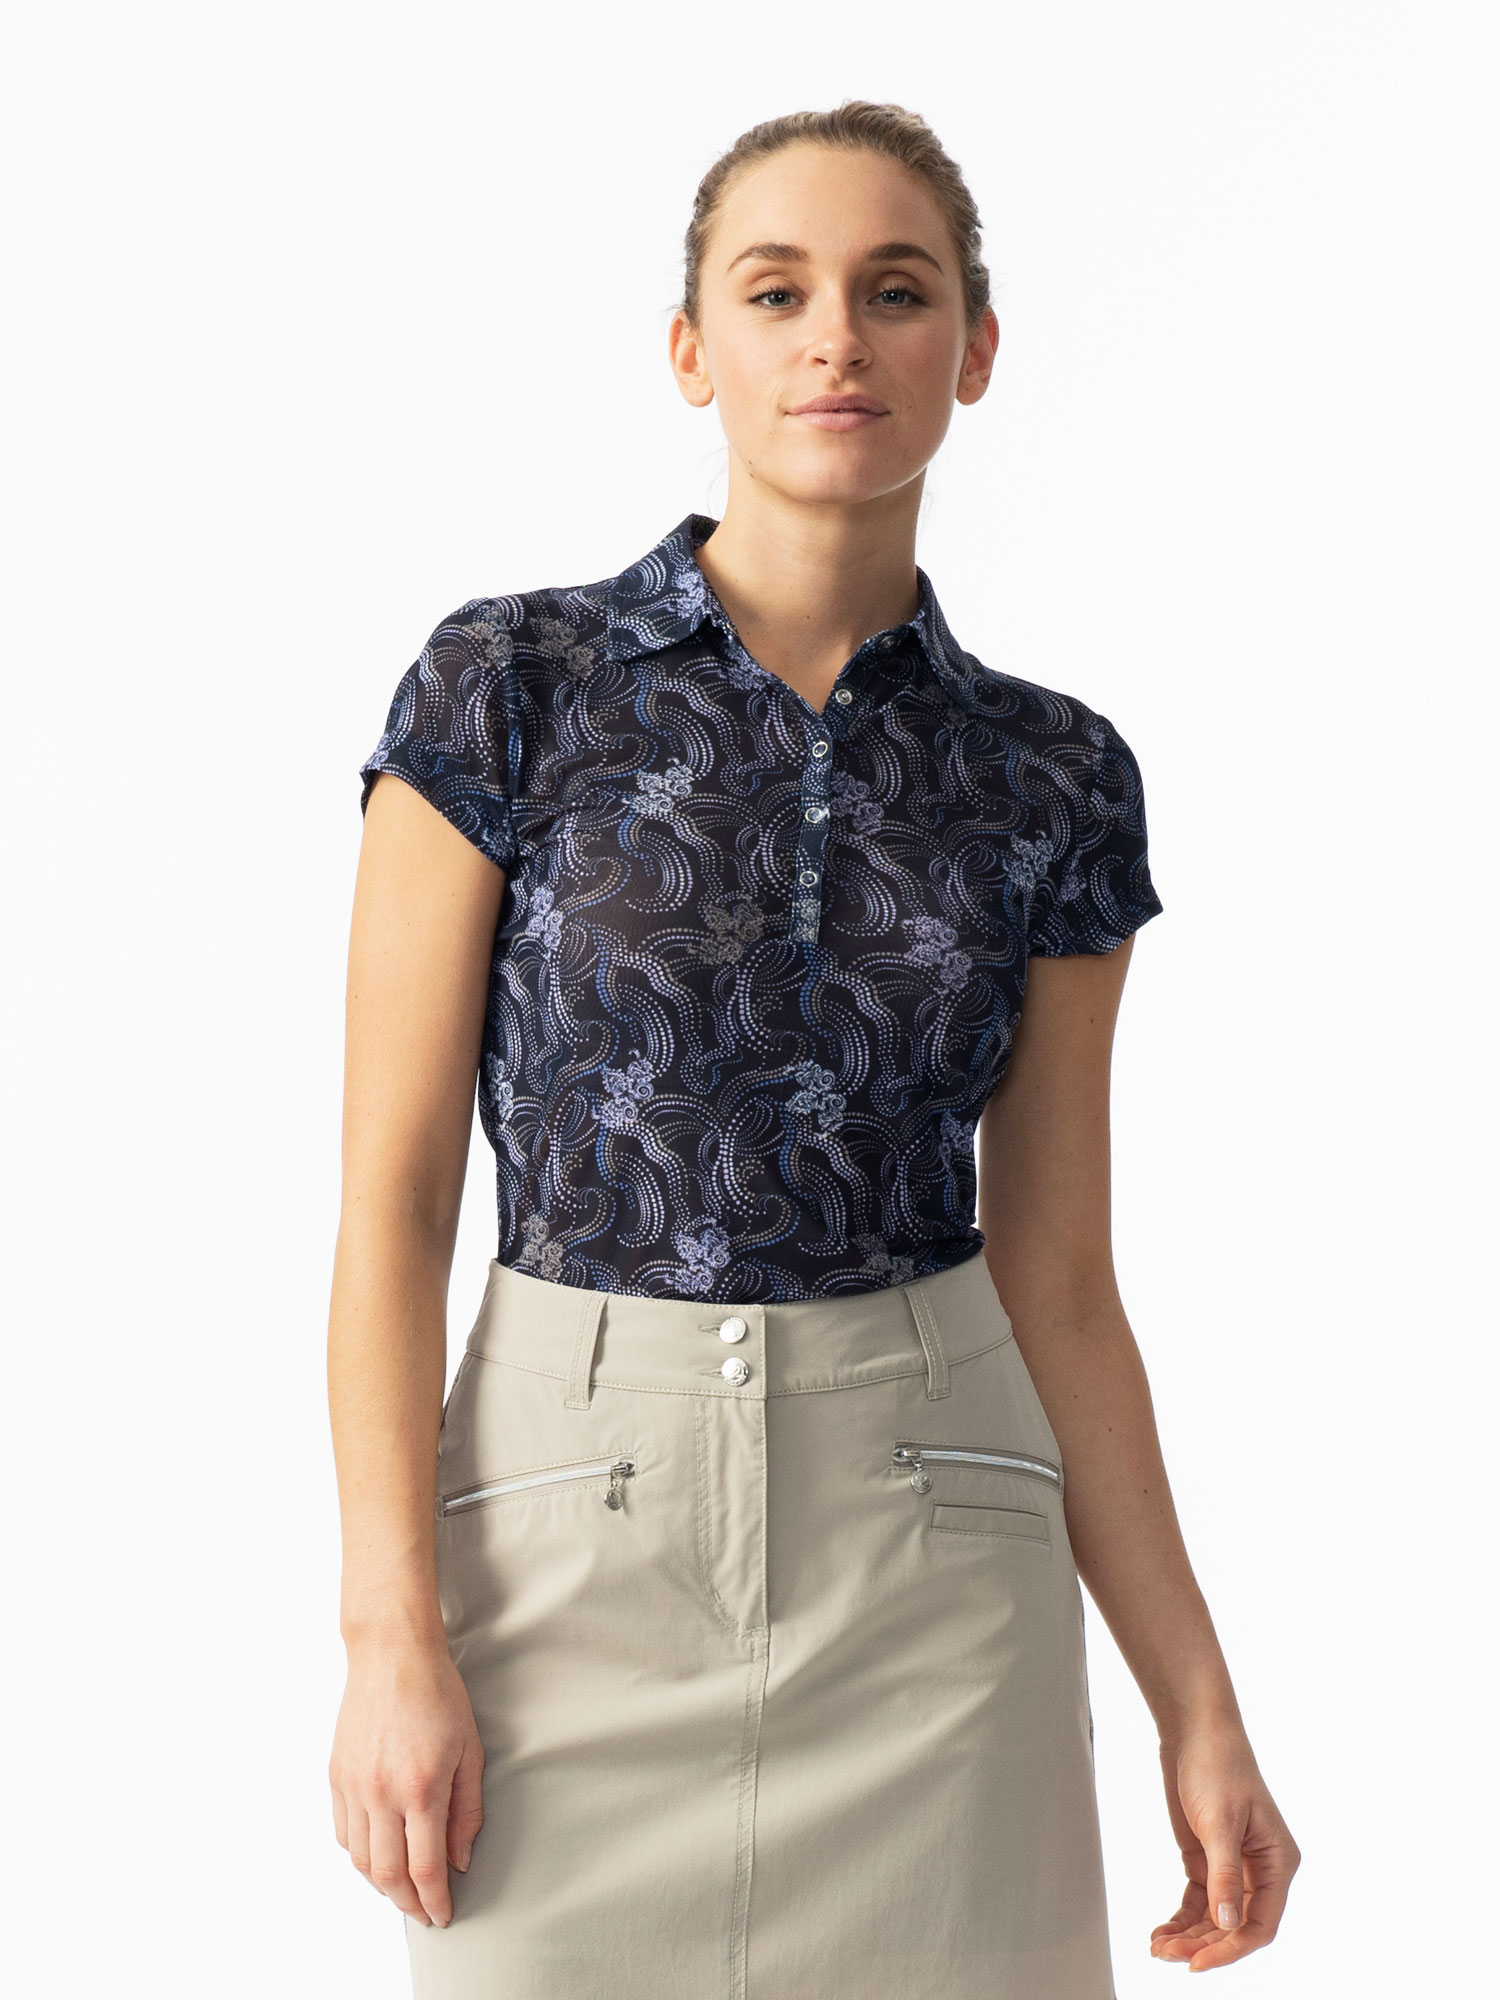 Luisa Short-sleeved Mesh Polo Shirt